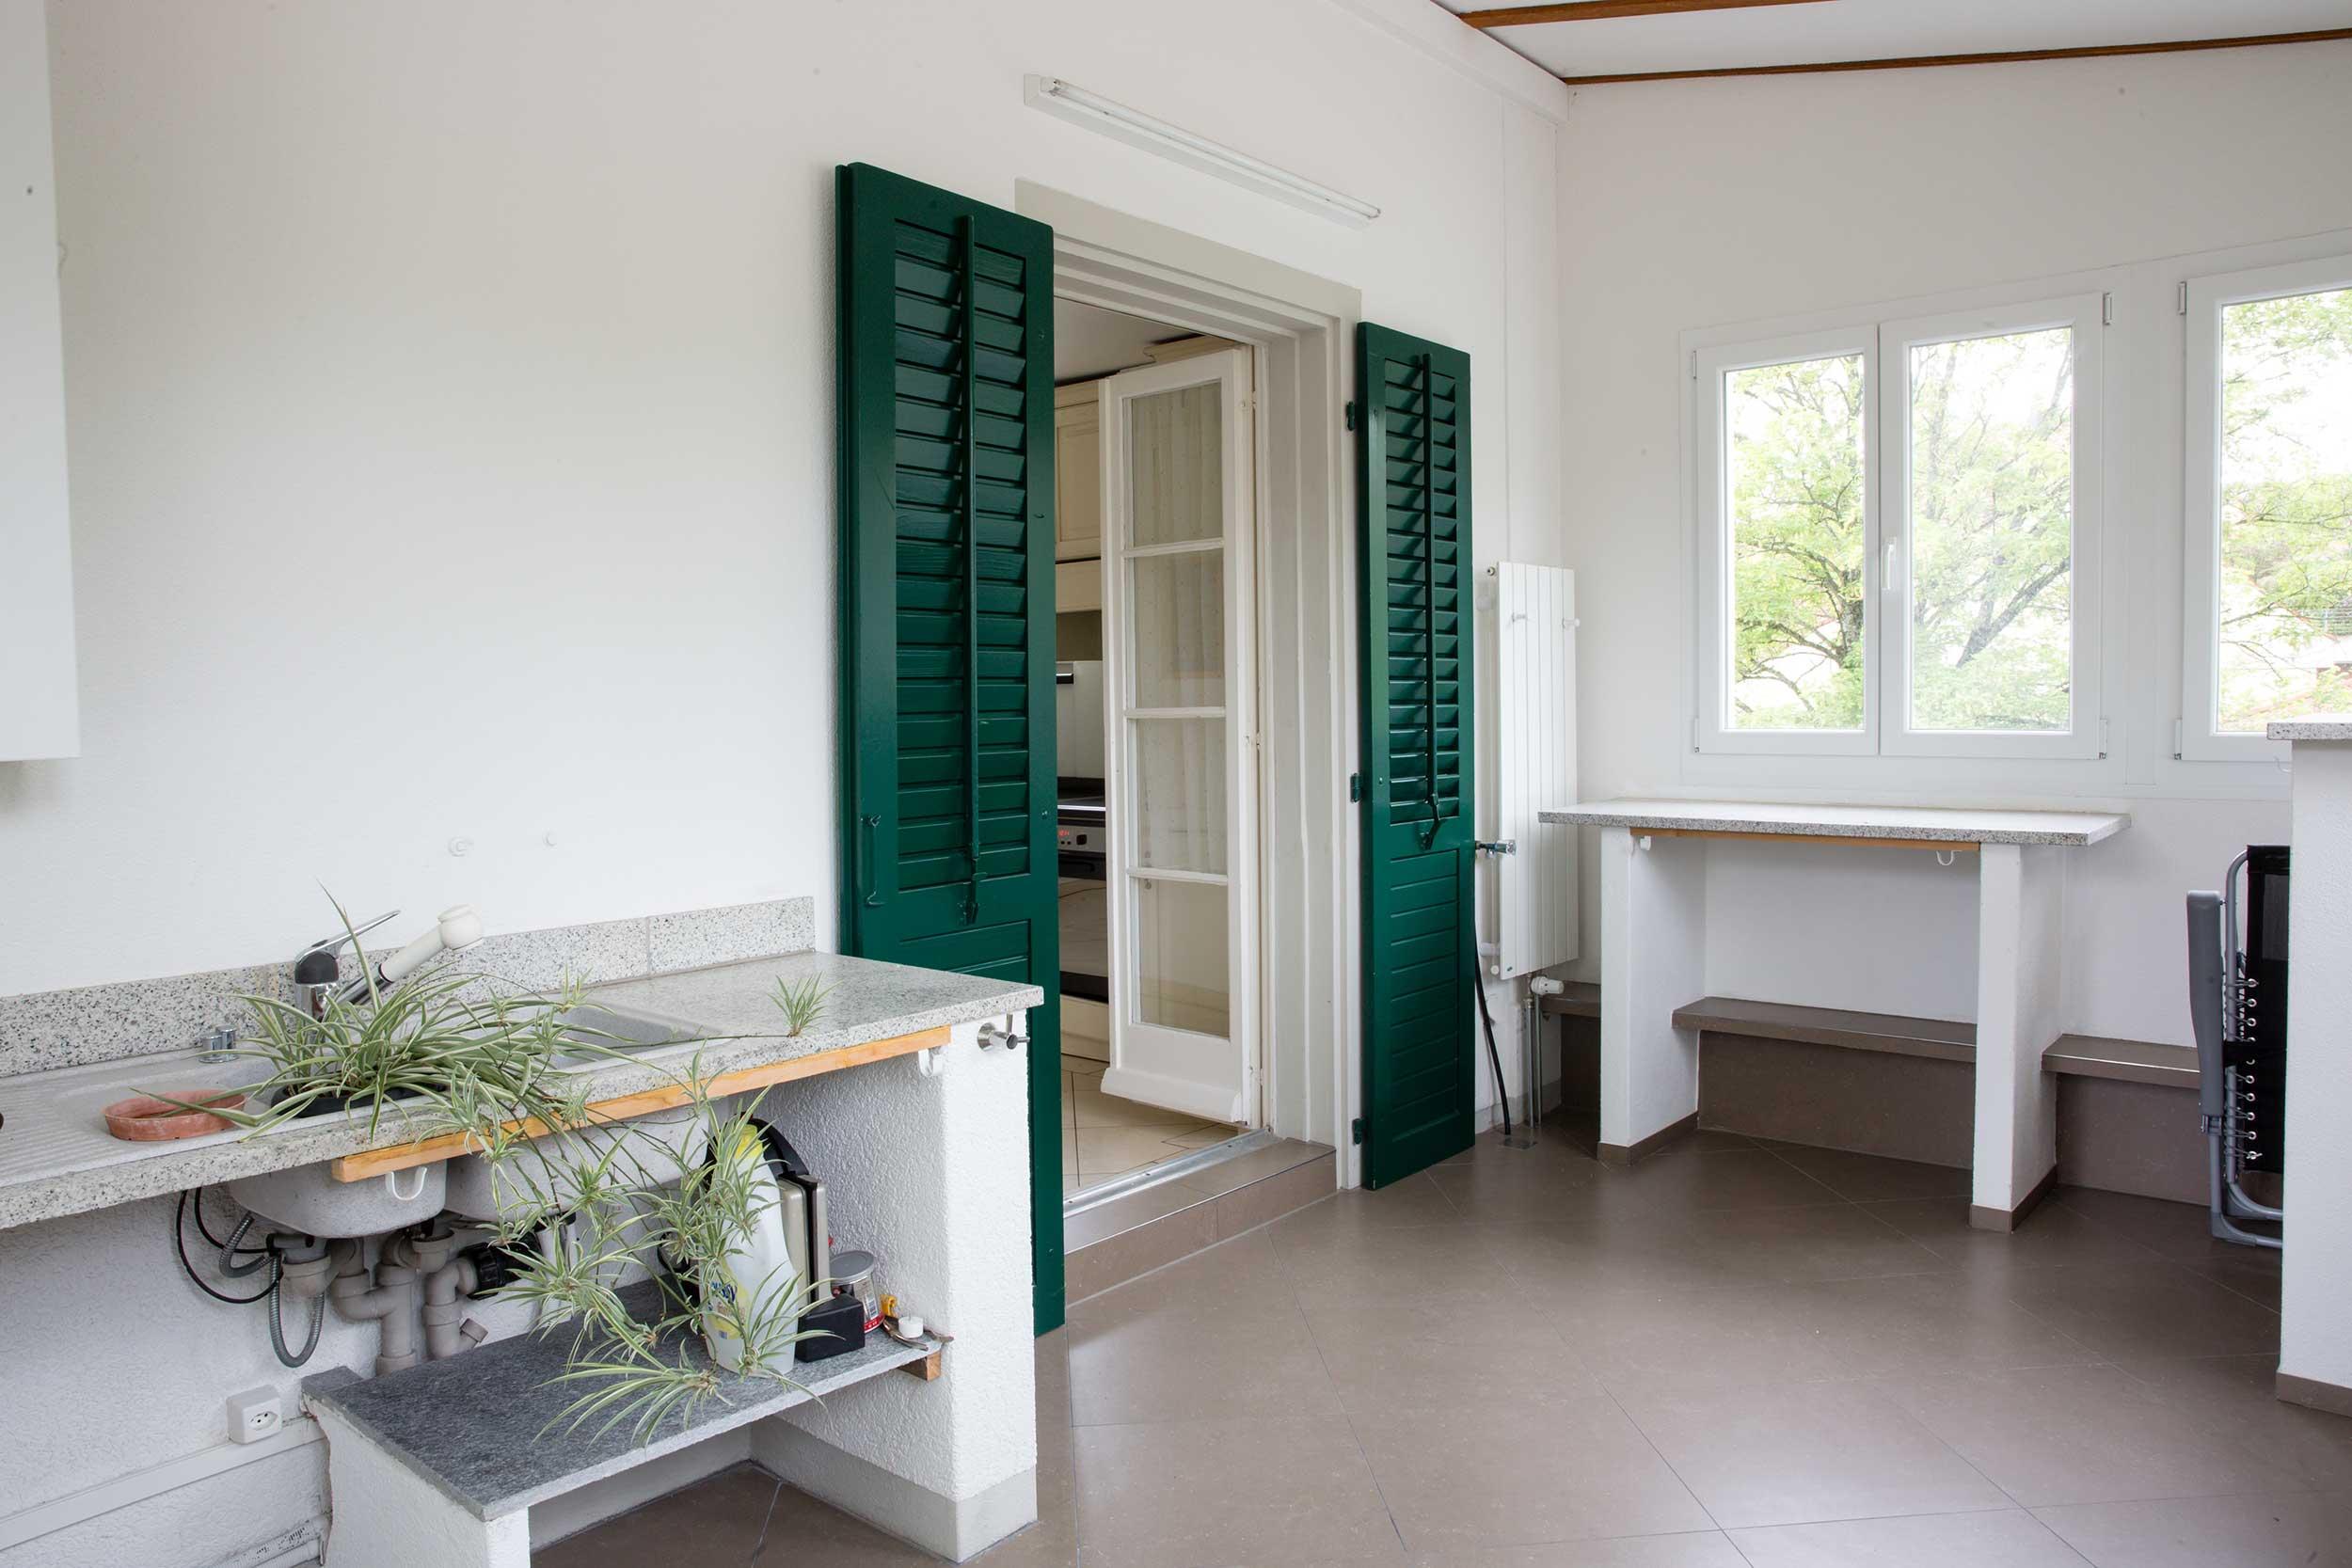 malerarbeiten giannasca pietro. Black Bedroom Furniture Sets. Home Design Ideas